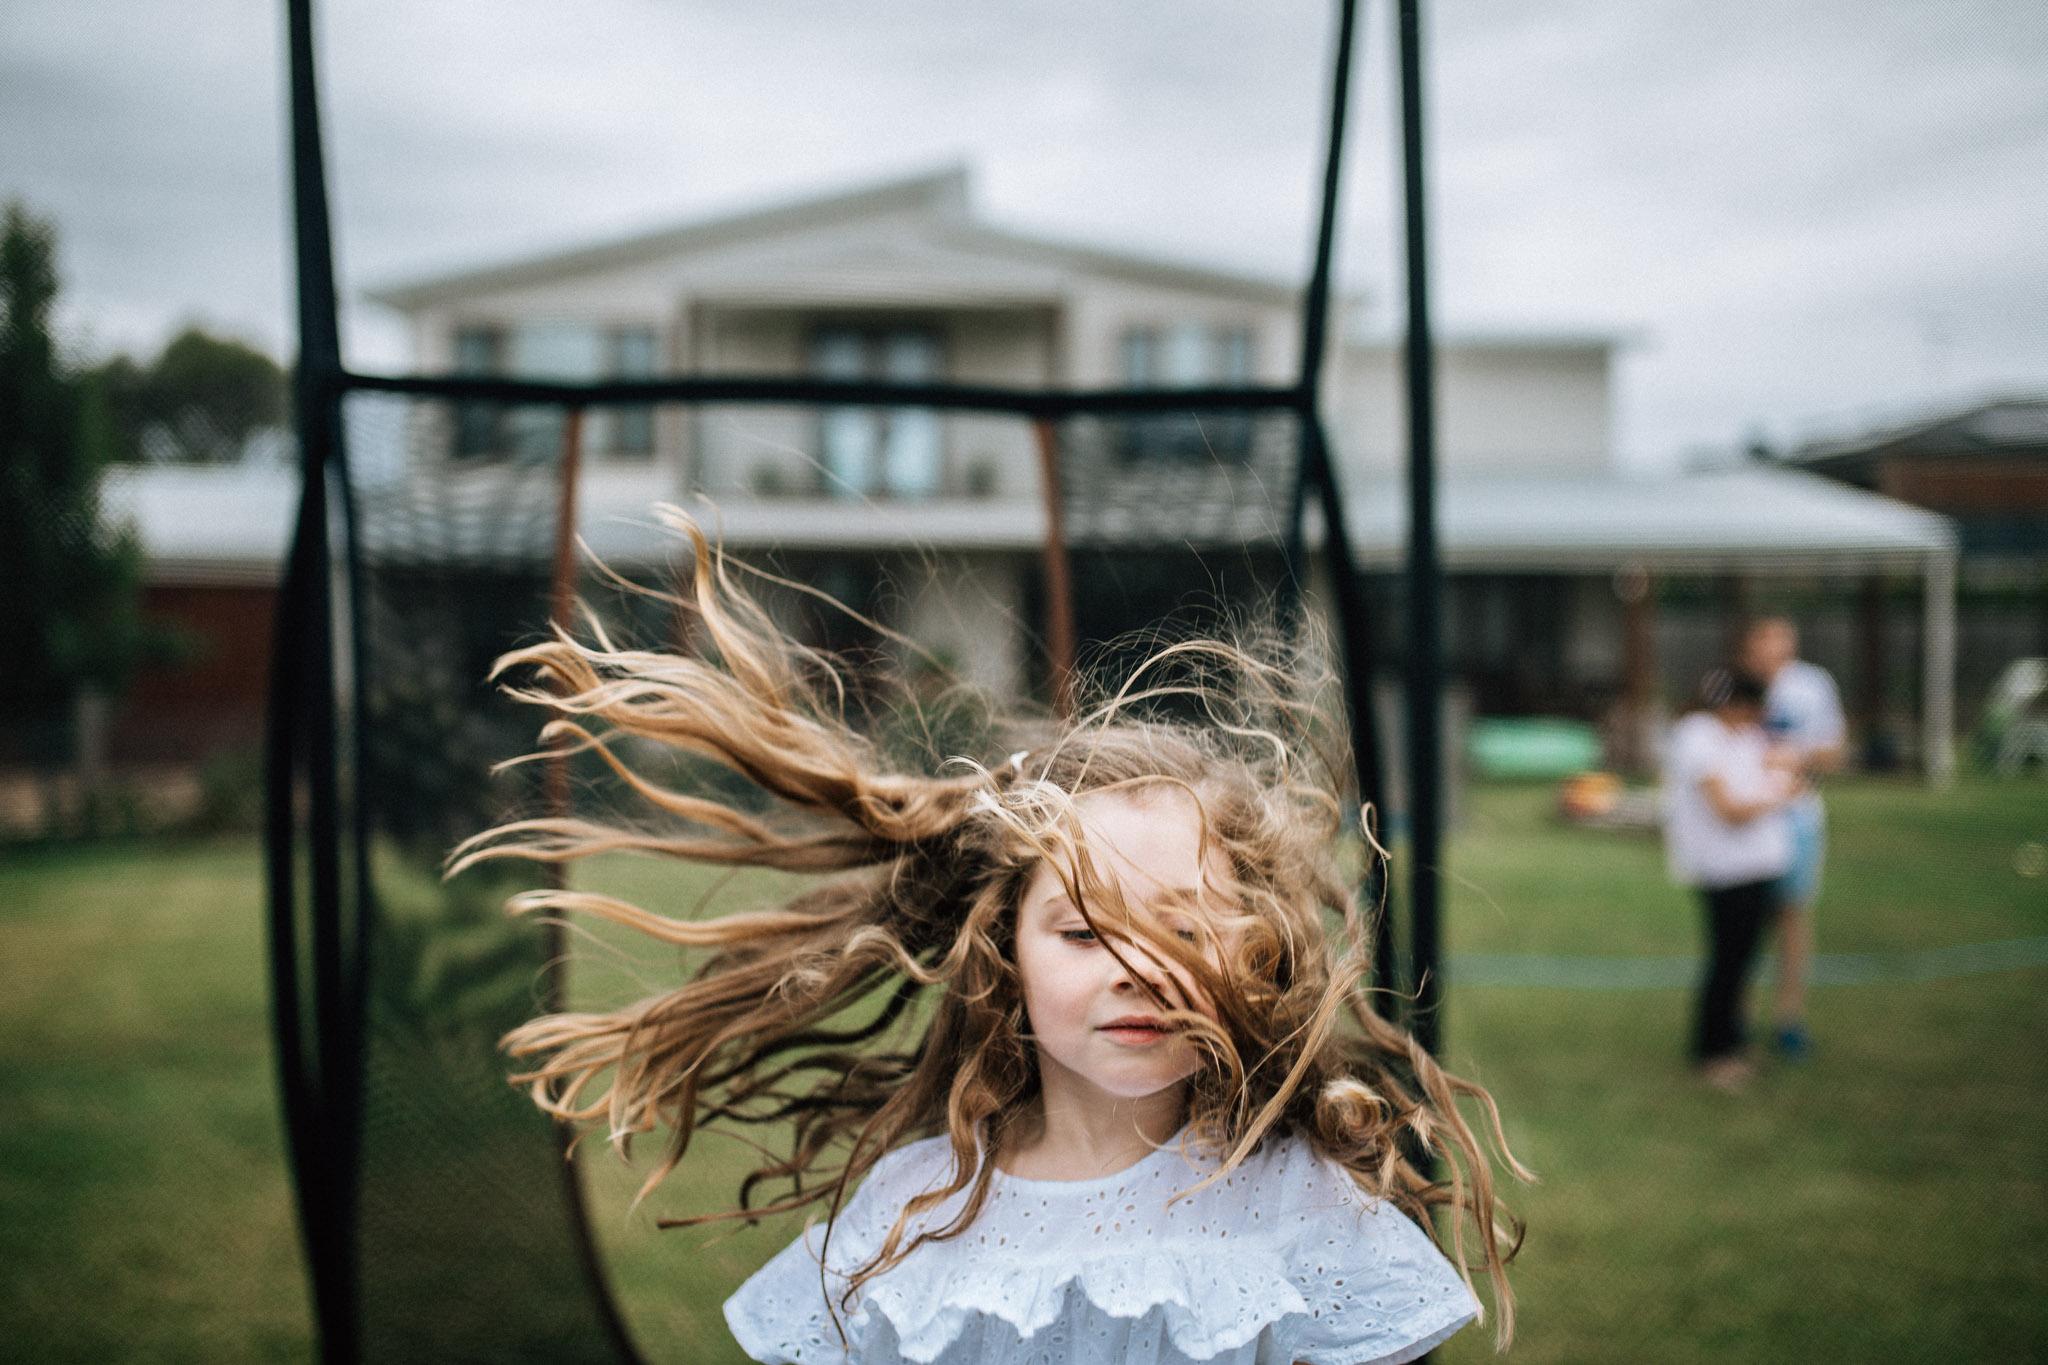 girl-on-trampoline-with-blonde-wavy-hair (1 of 1).jpg